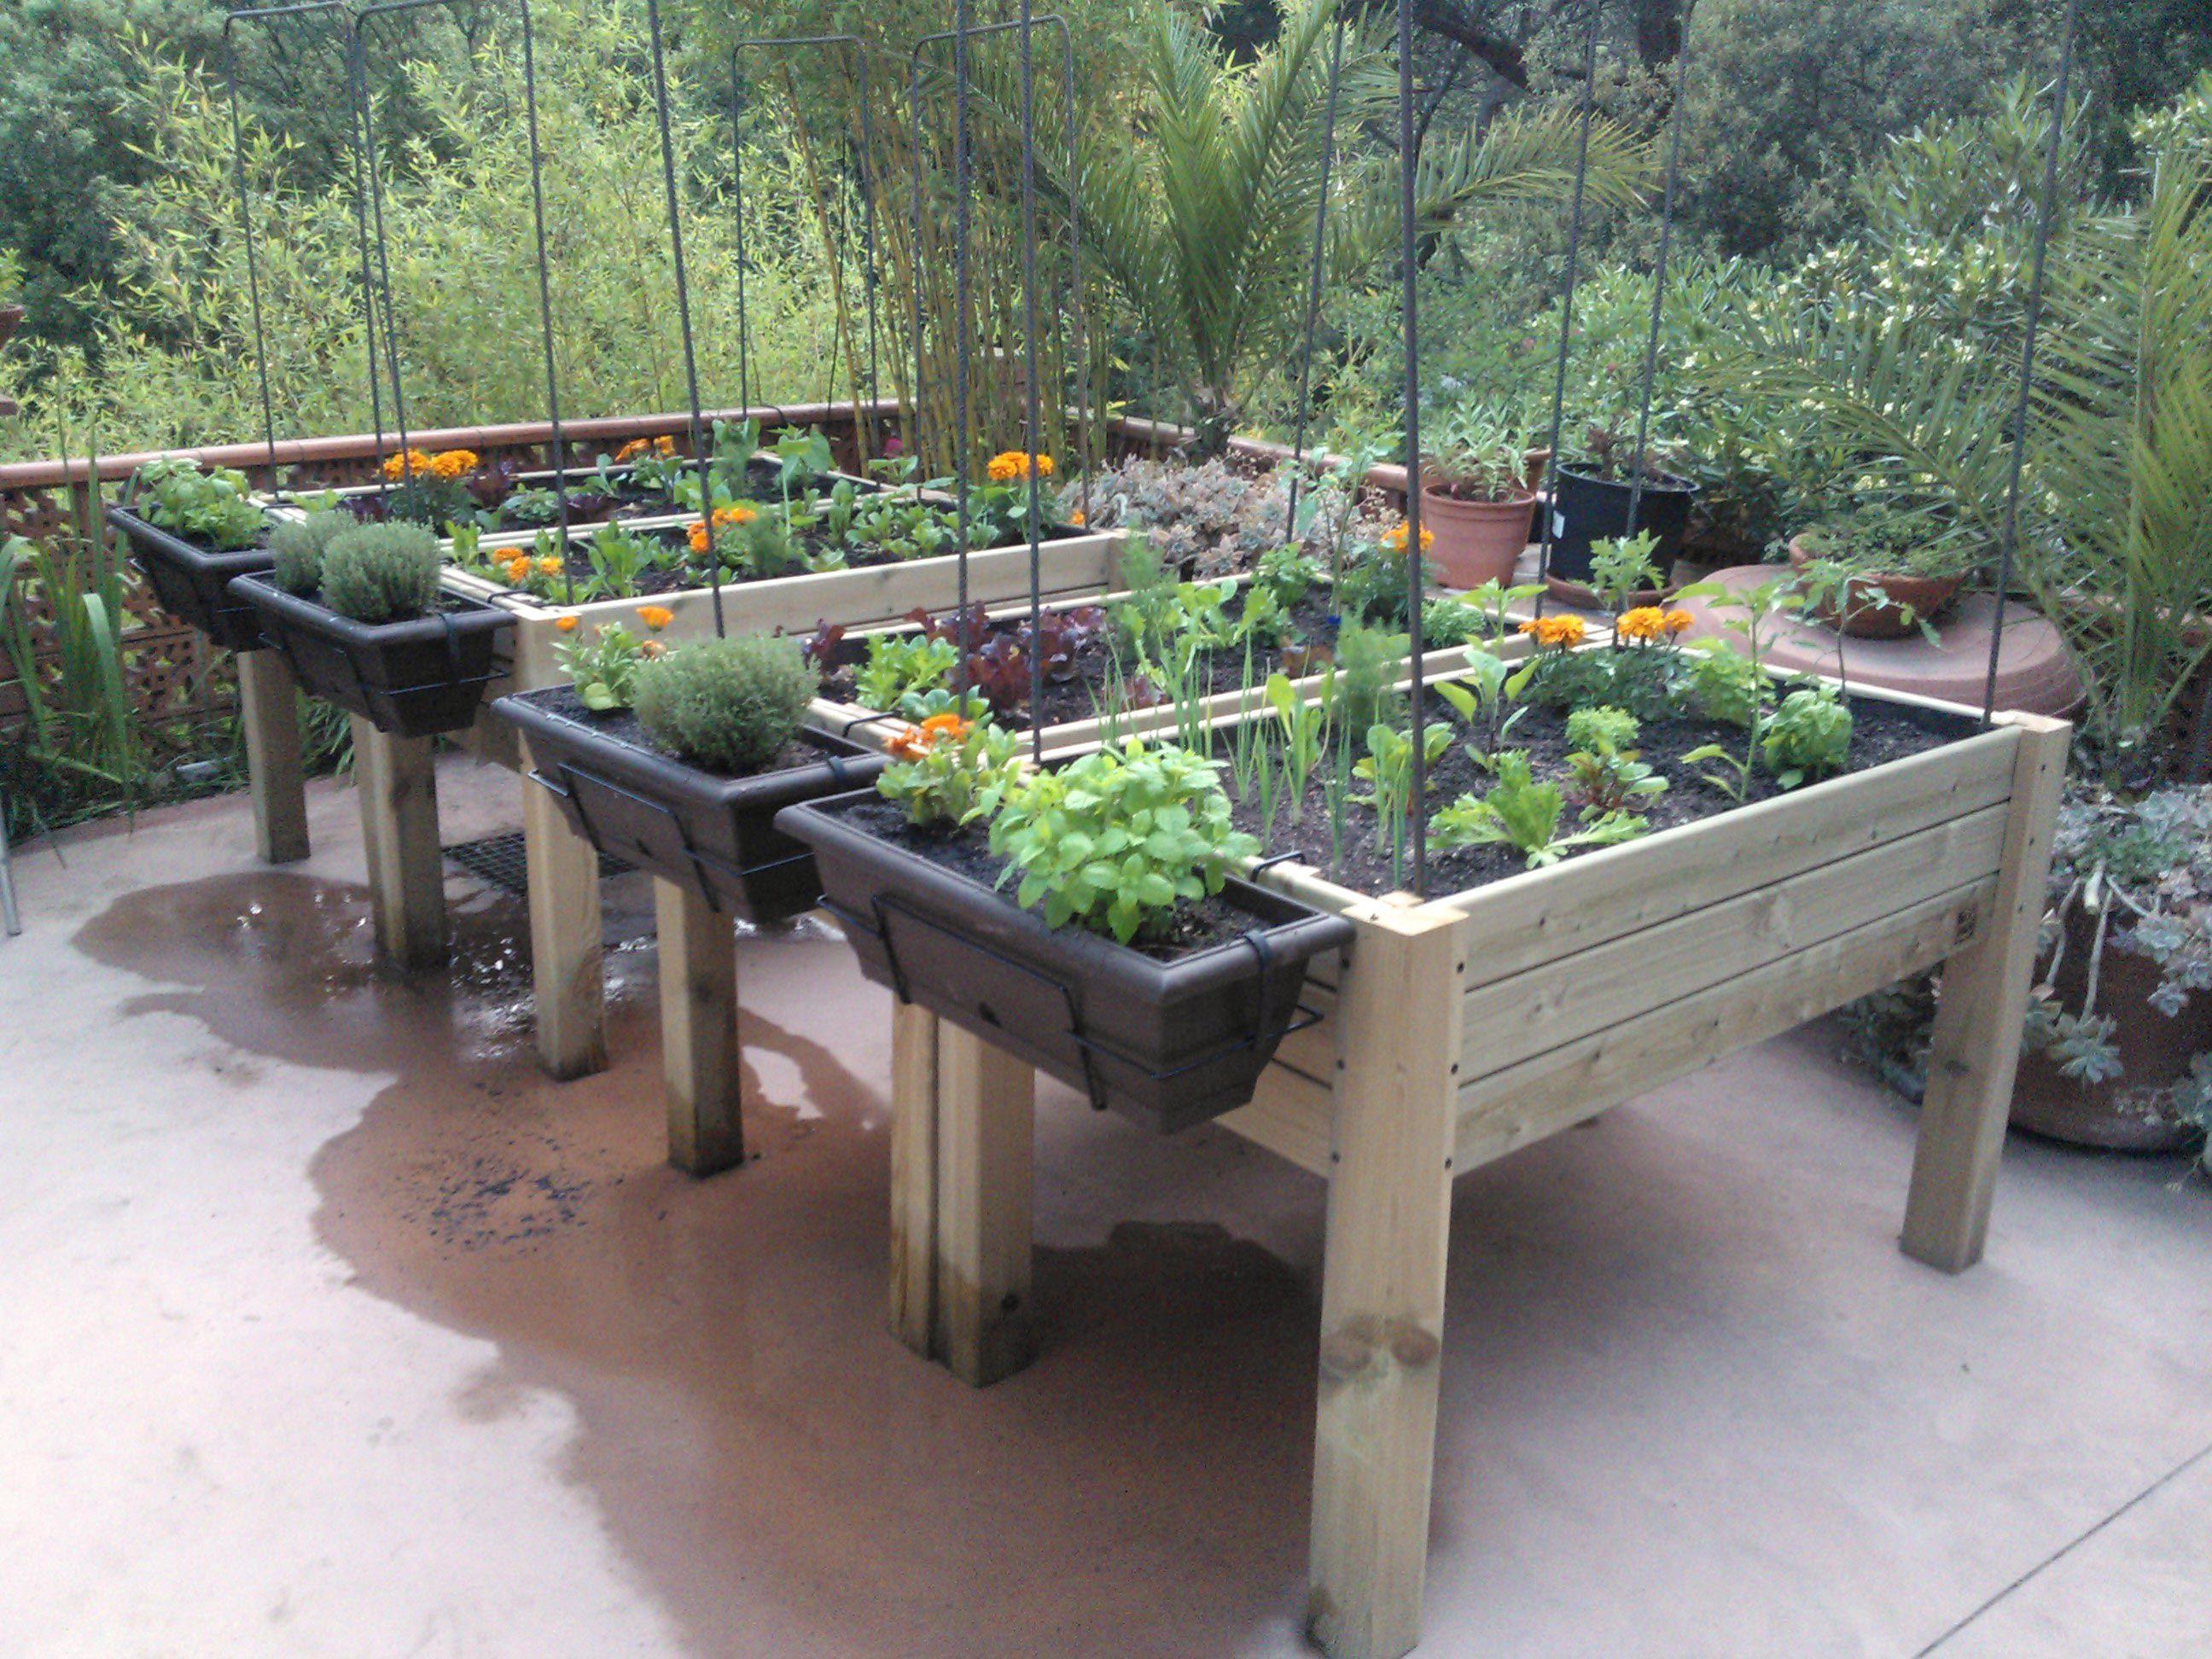 Mesa cultivo kit 122x62x80 green business pinterest for Mesas de cultivo urbano